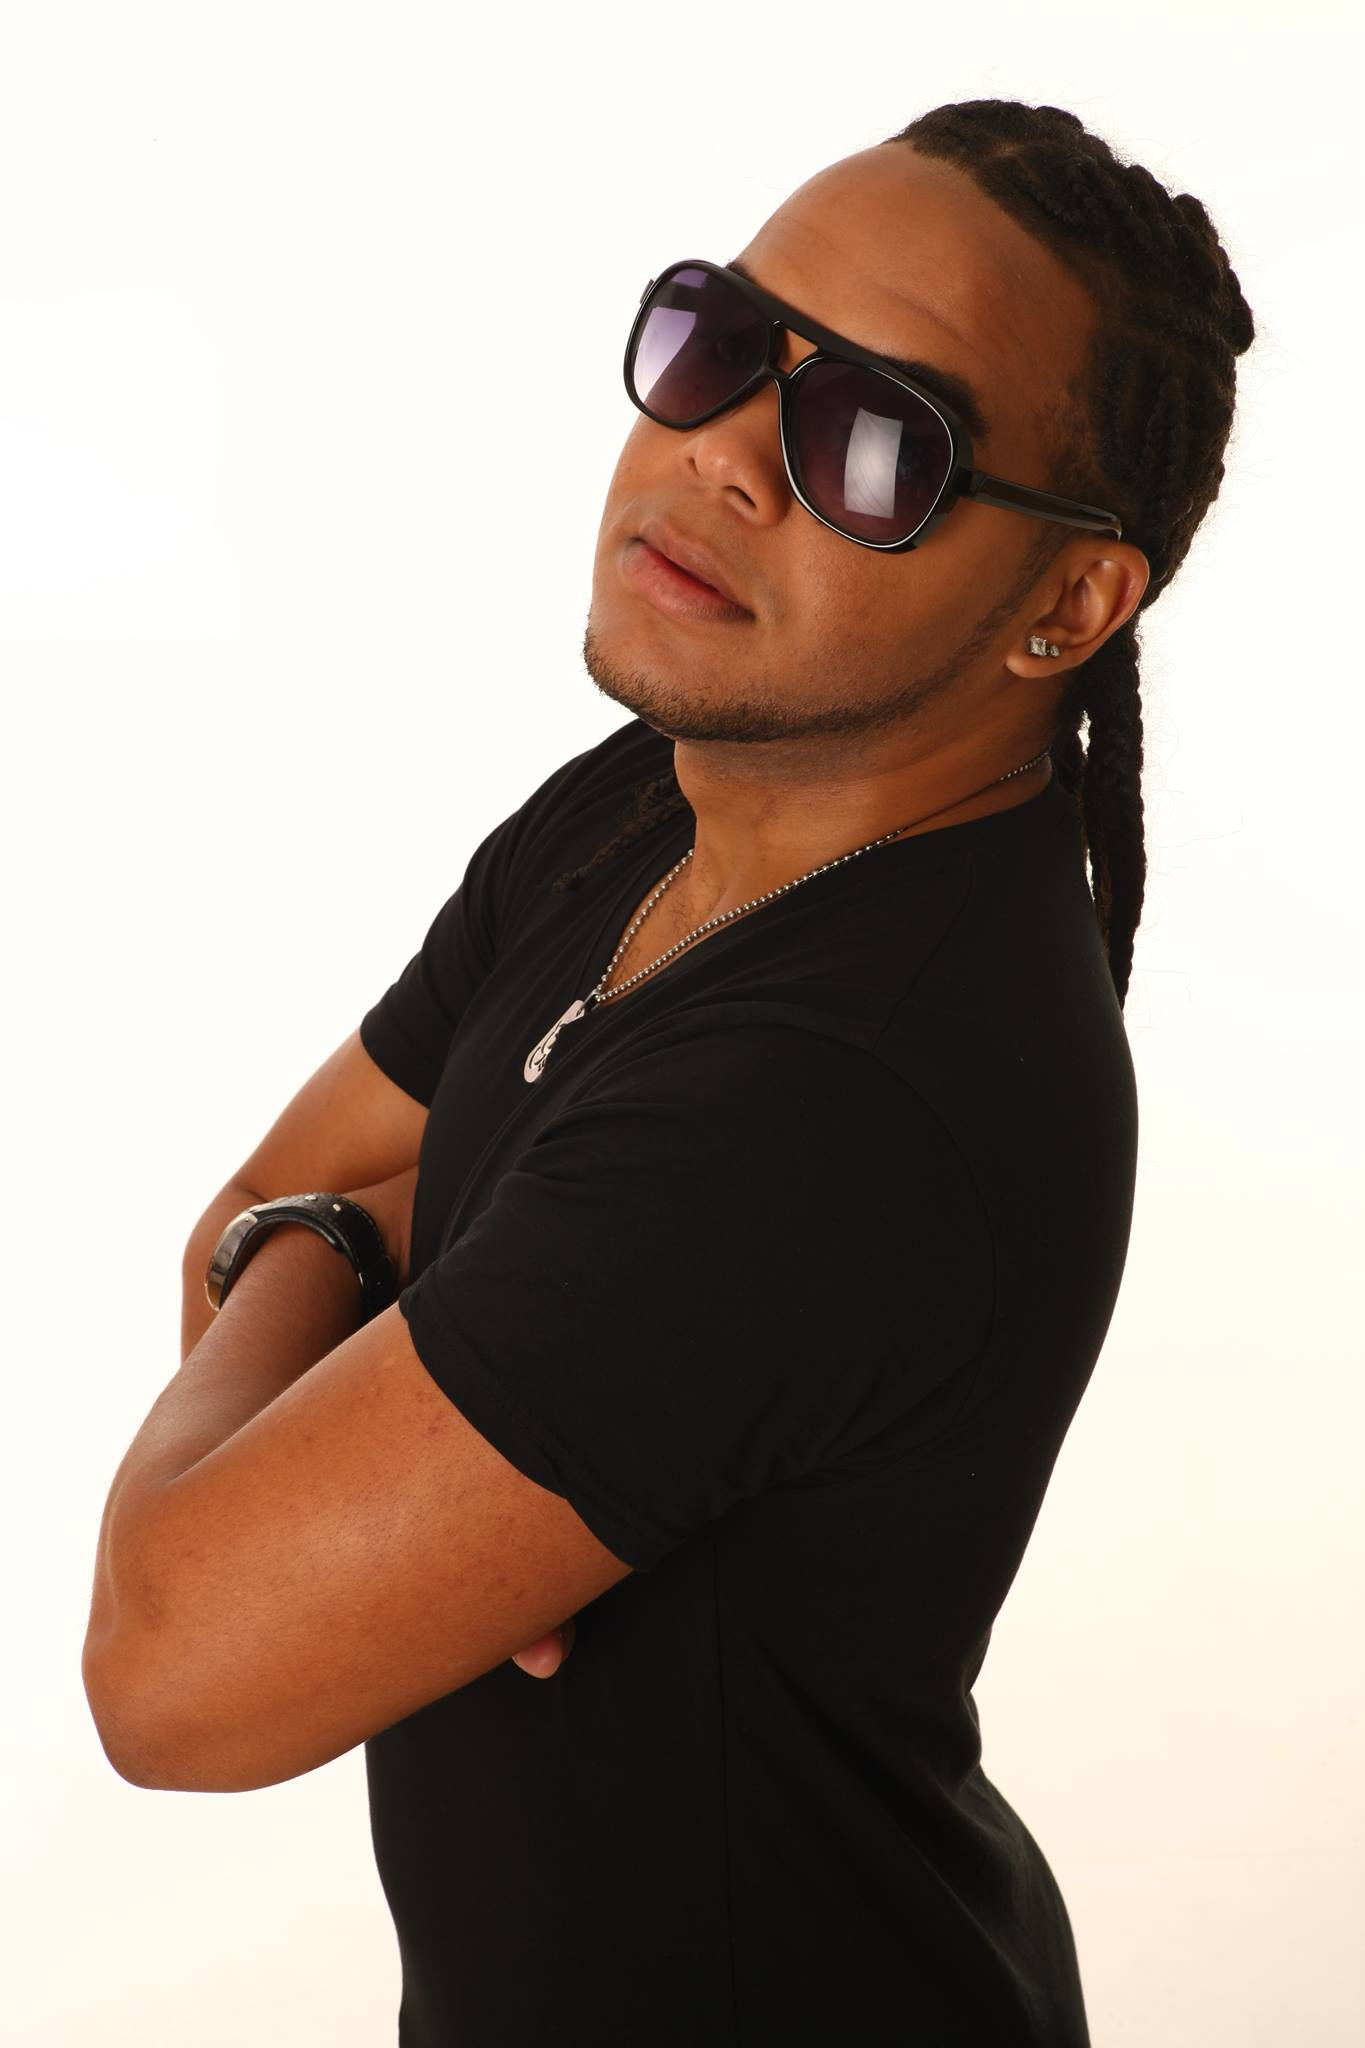 Dany the bad boy (Dany El Cuelno)